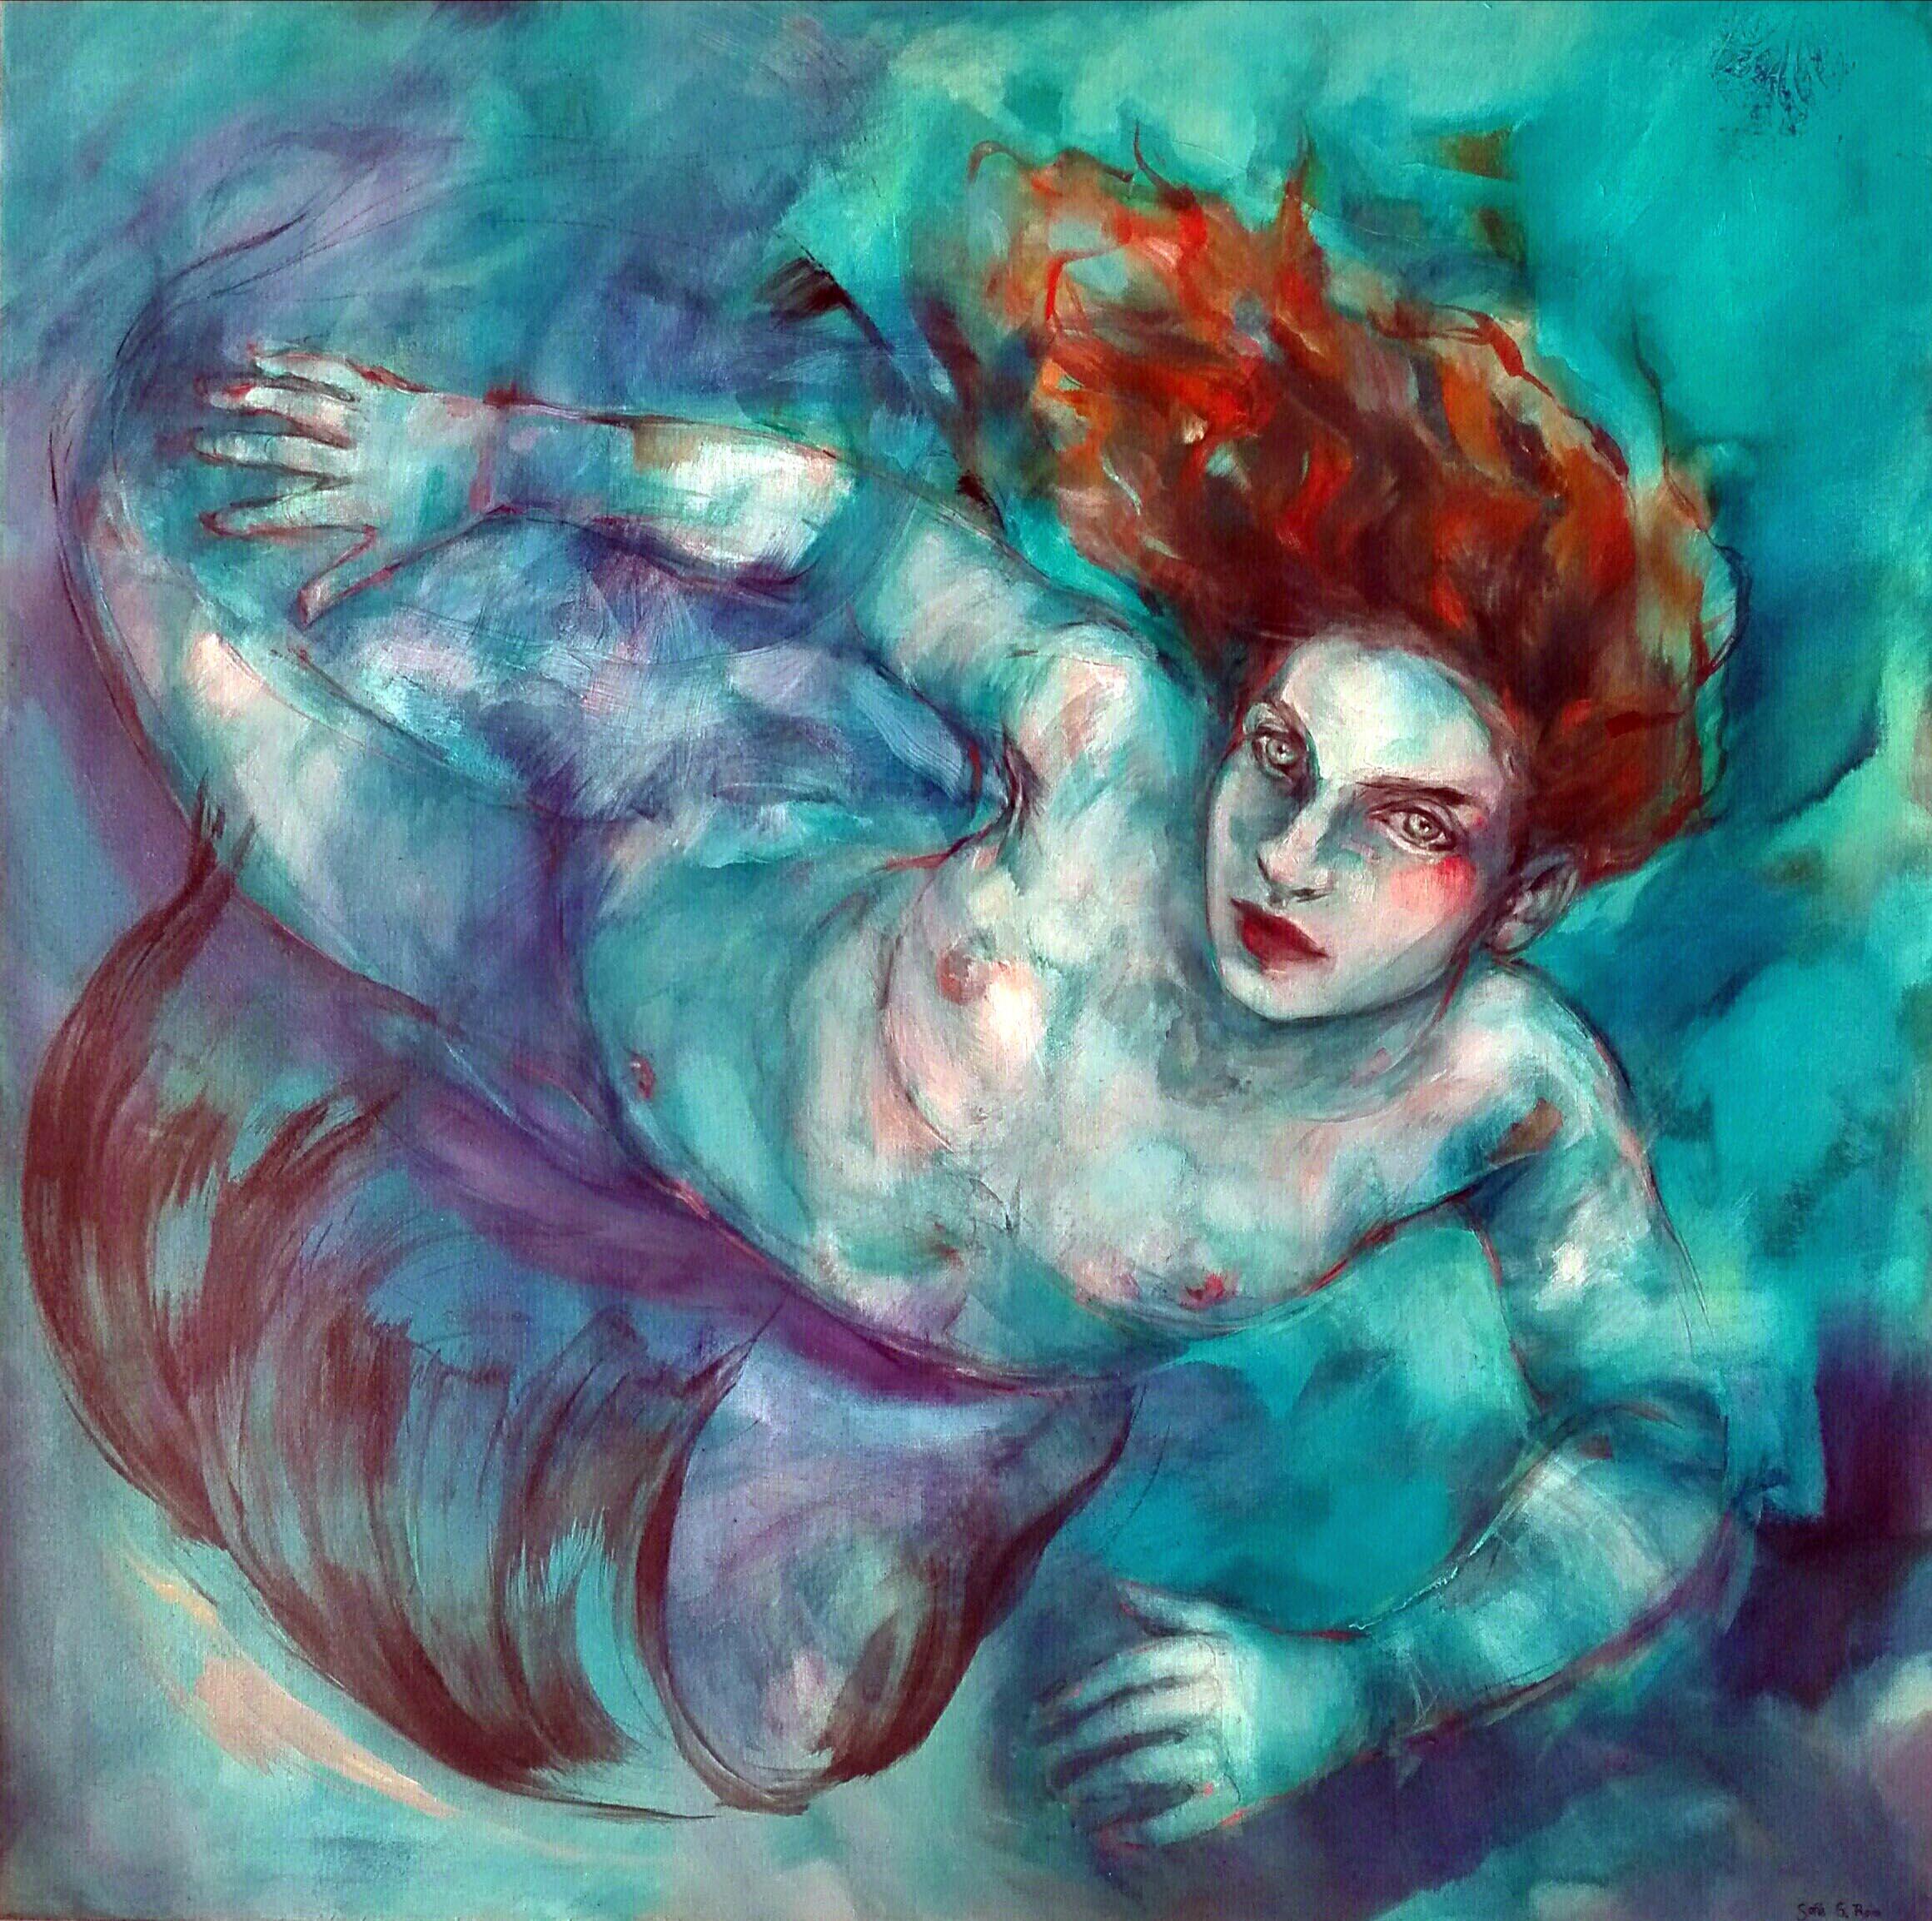 Sirena azul (2019) - Sofia G. Ruiz